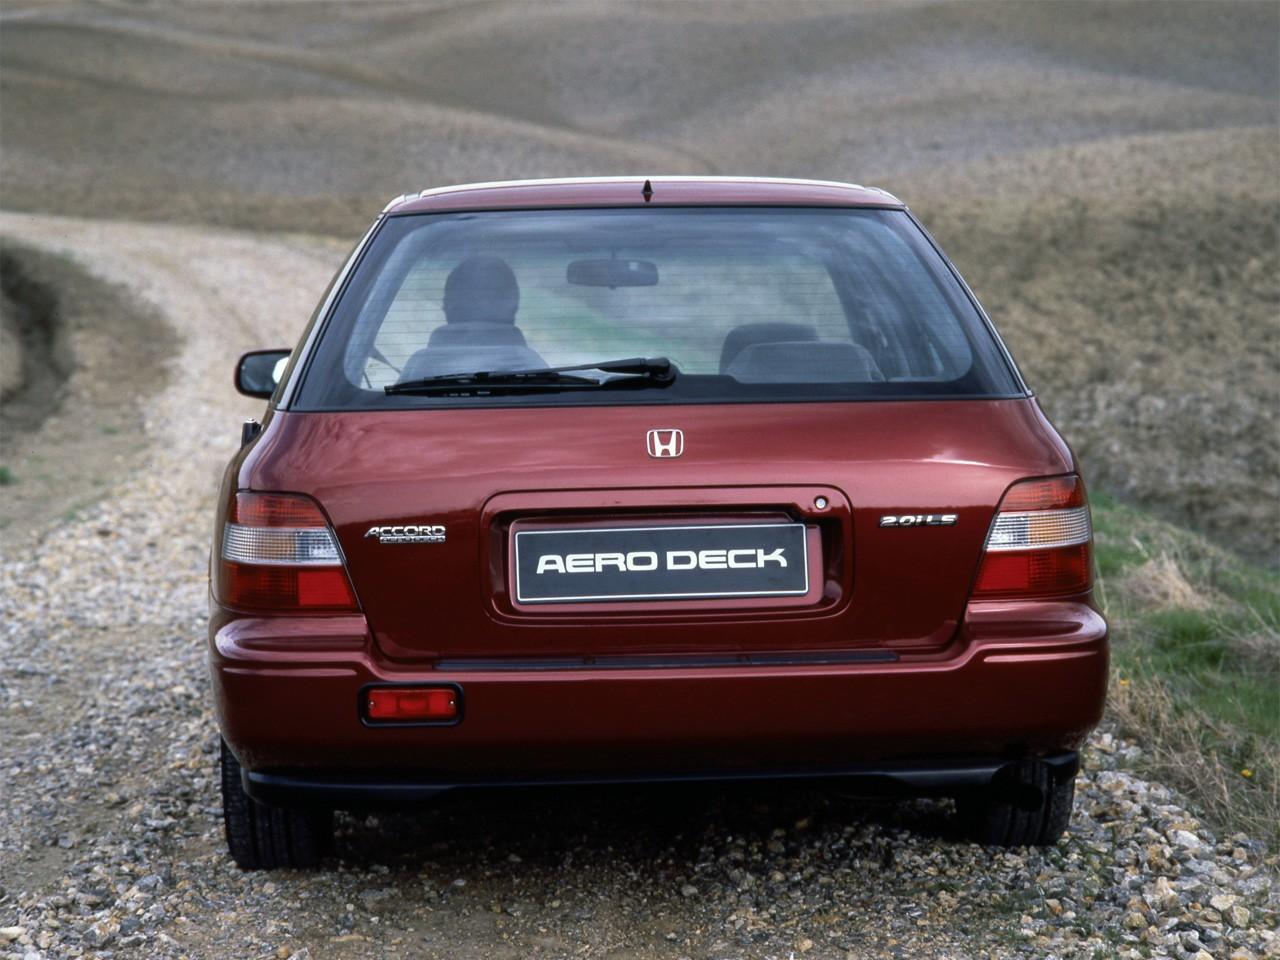 HONDA Accord Aerodeck - 1993, 1994 - autoevolution